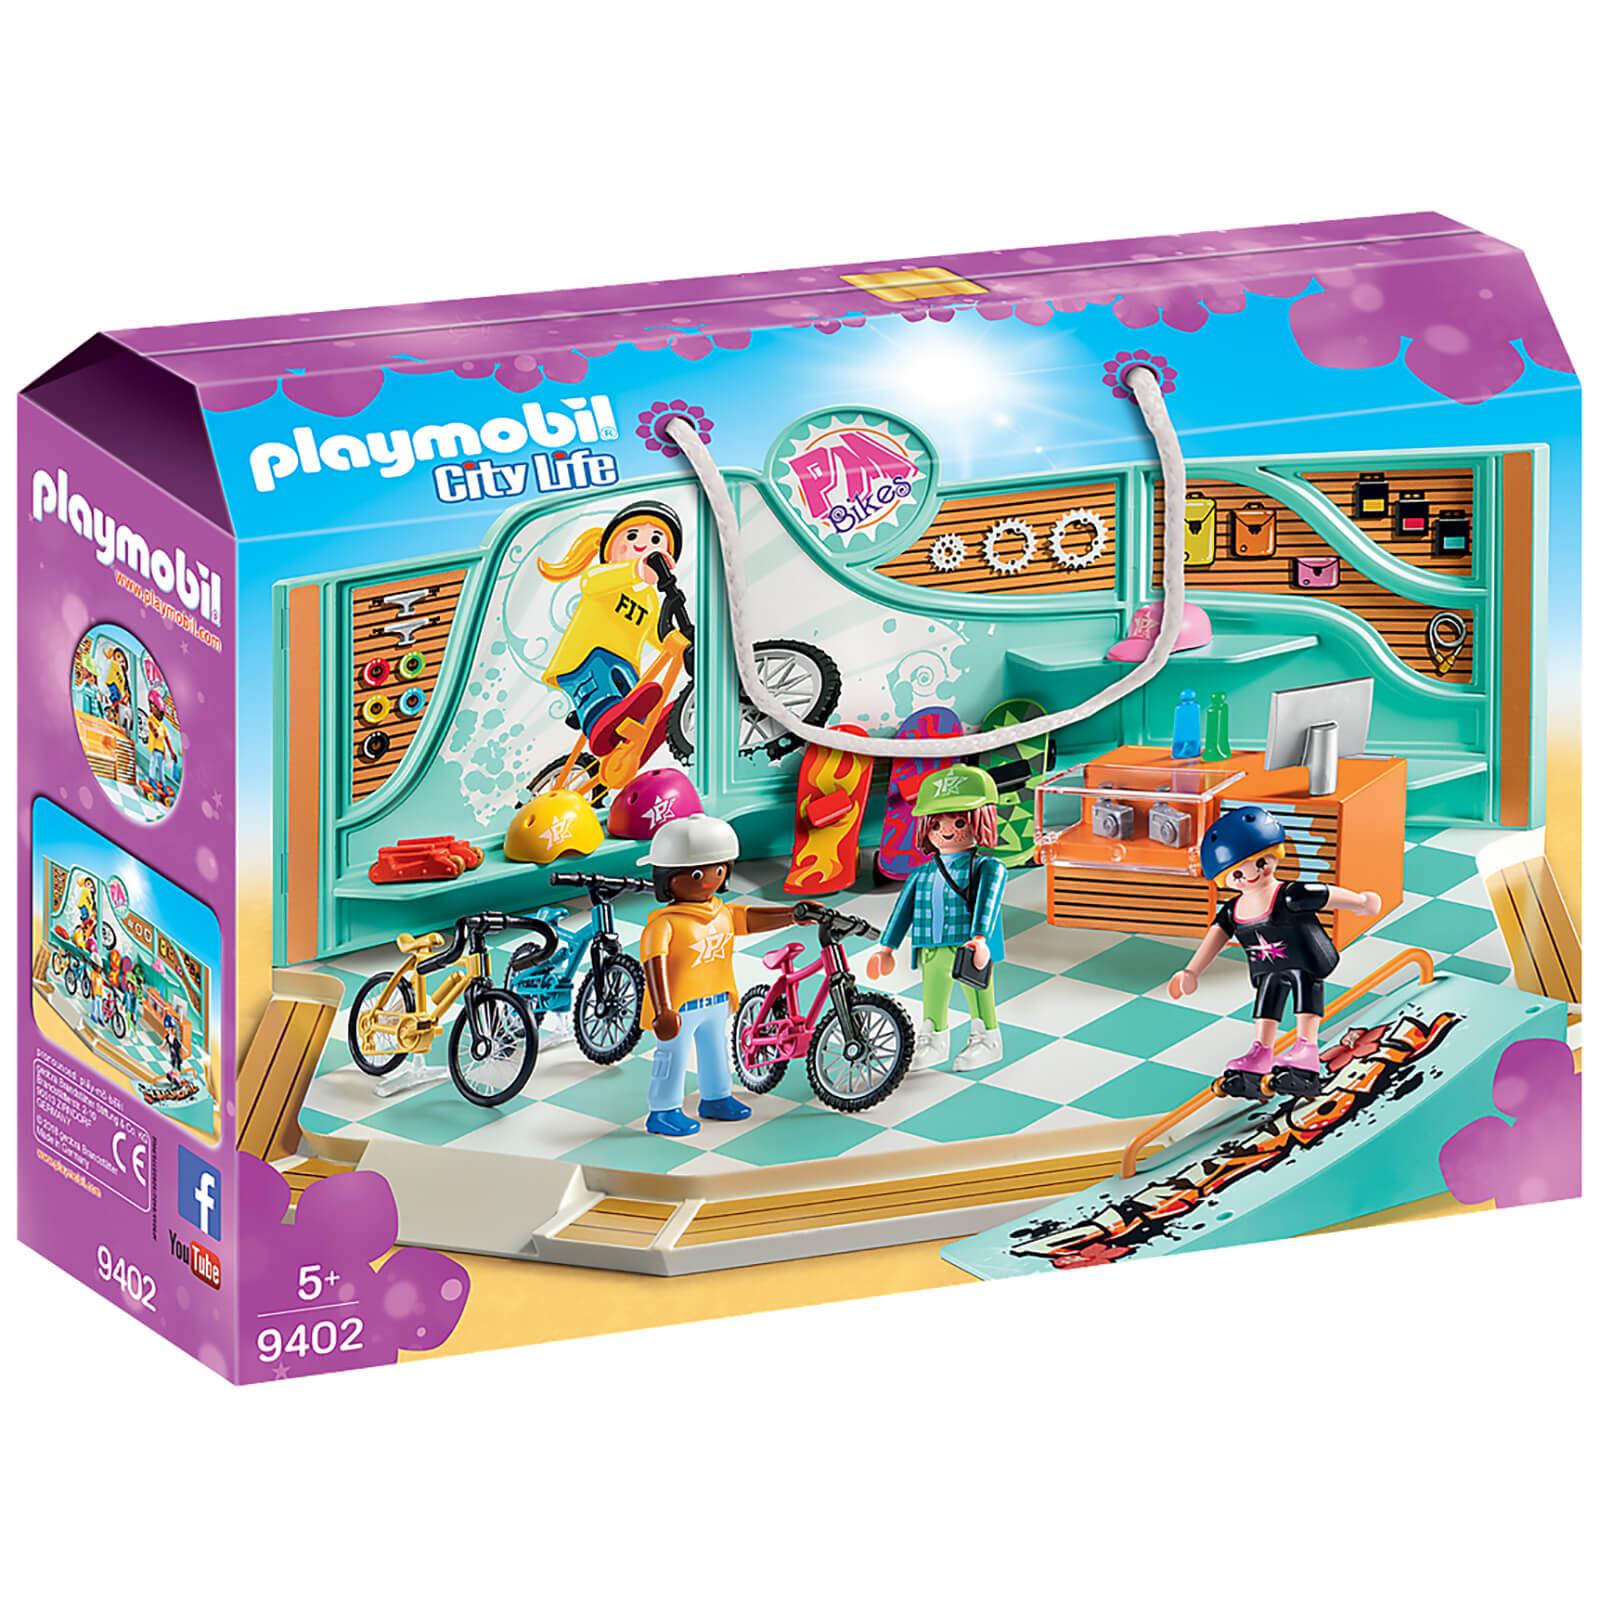 Playmobil City Life Bike And Skate Shop With Ramp (9402)